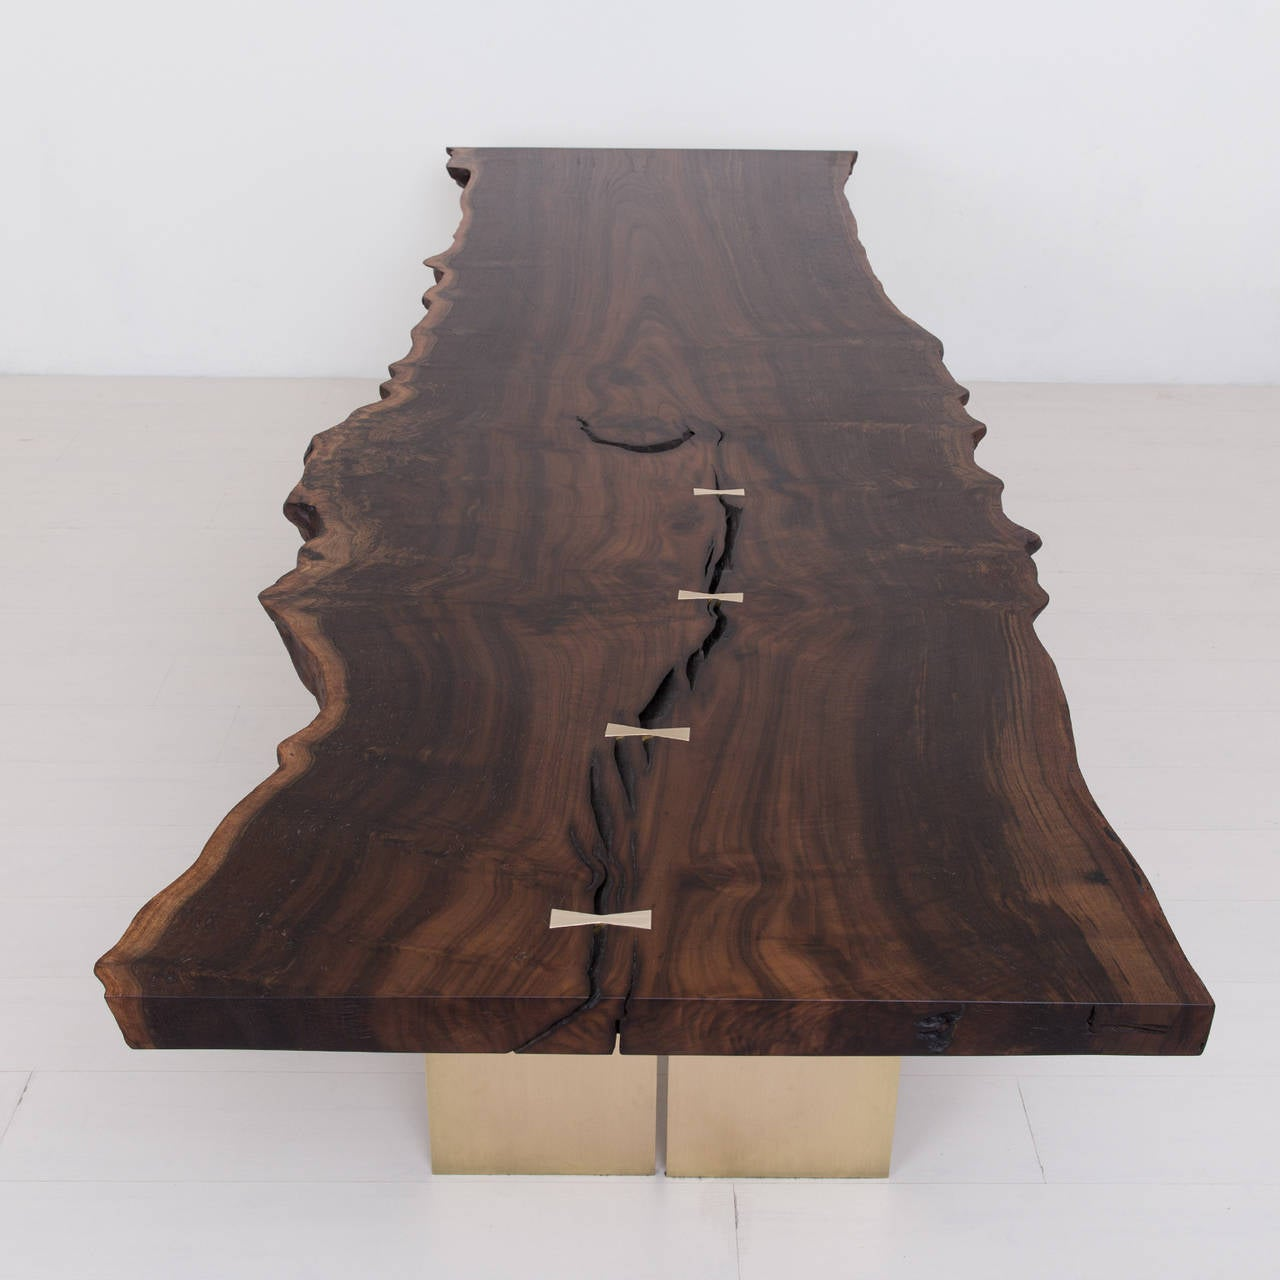 Milo Base Dining Table by Uhuru Design, Claro Walnut, Brass 4